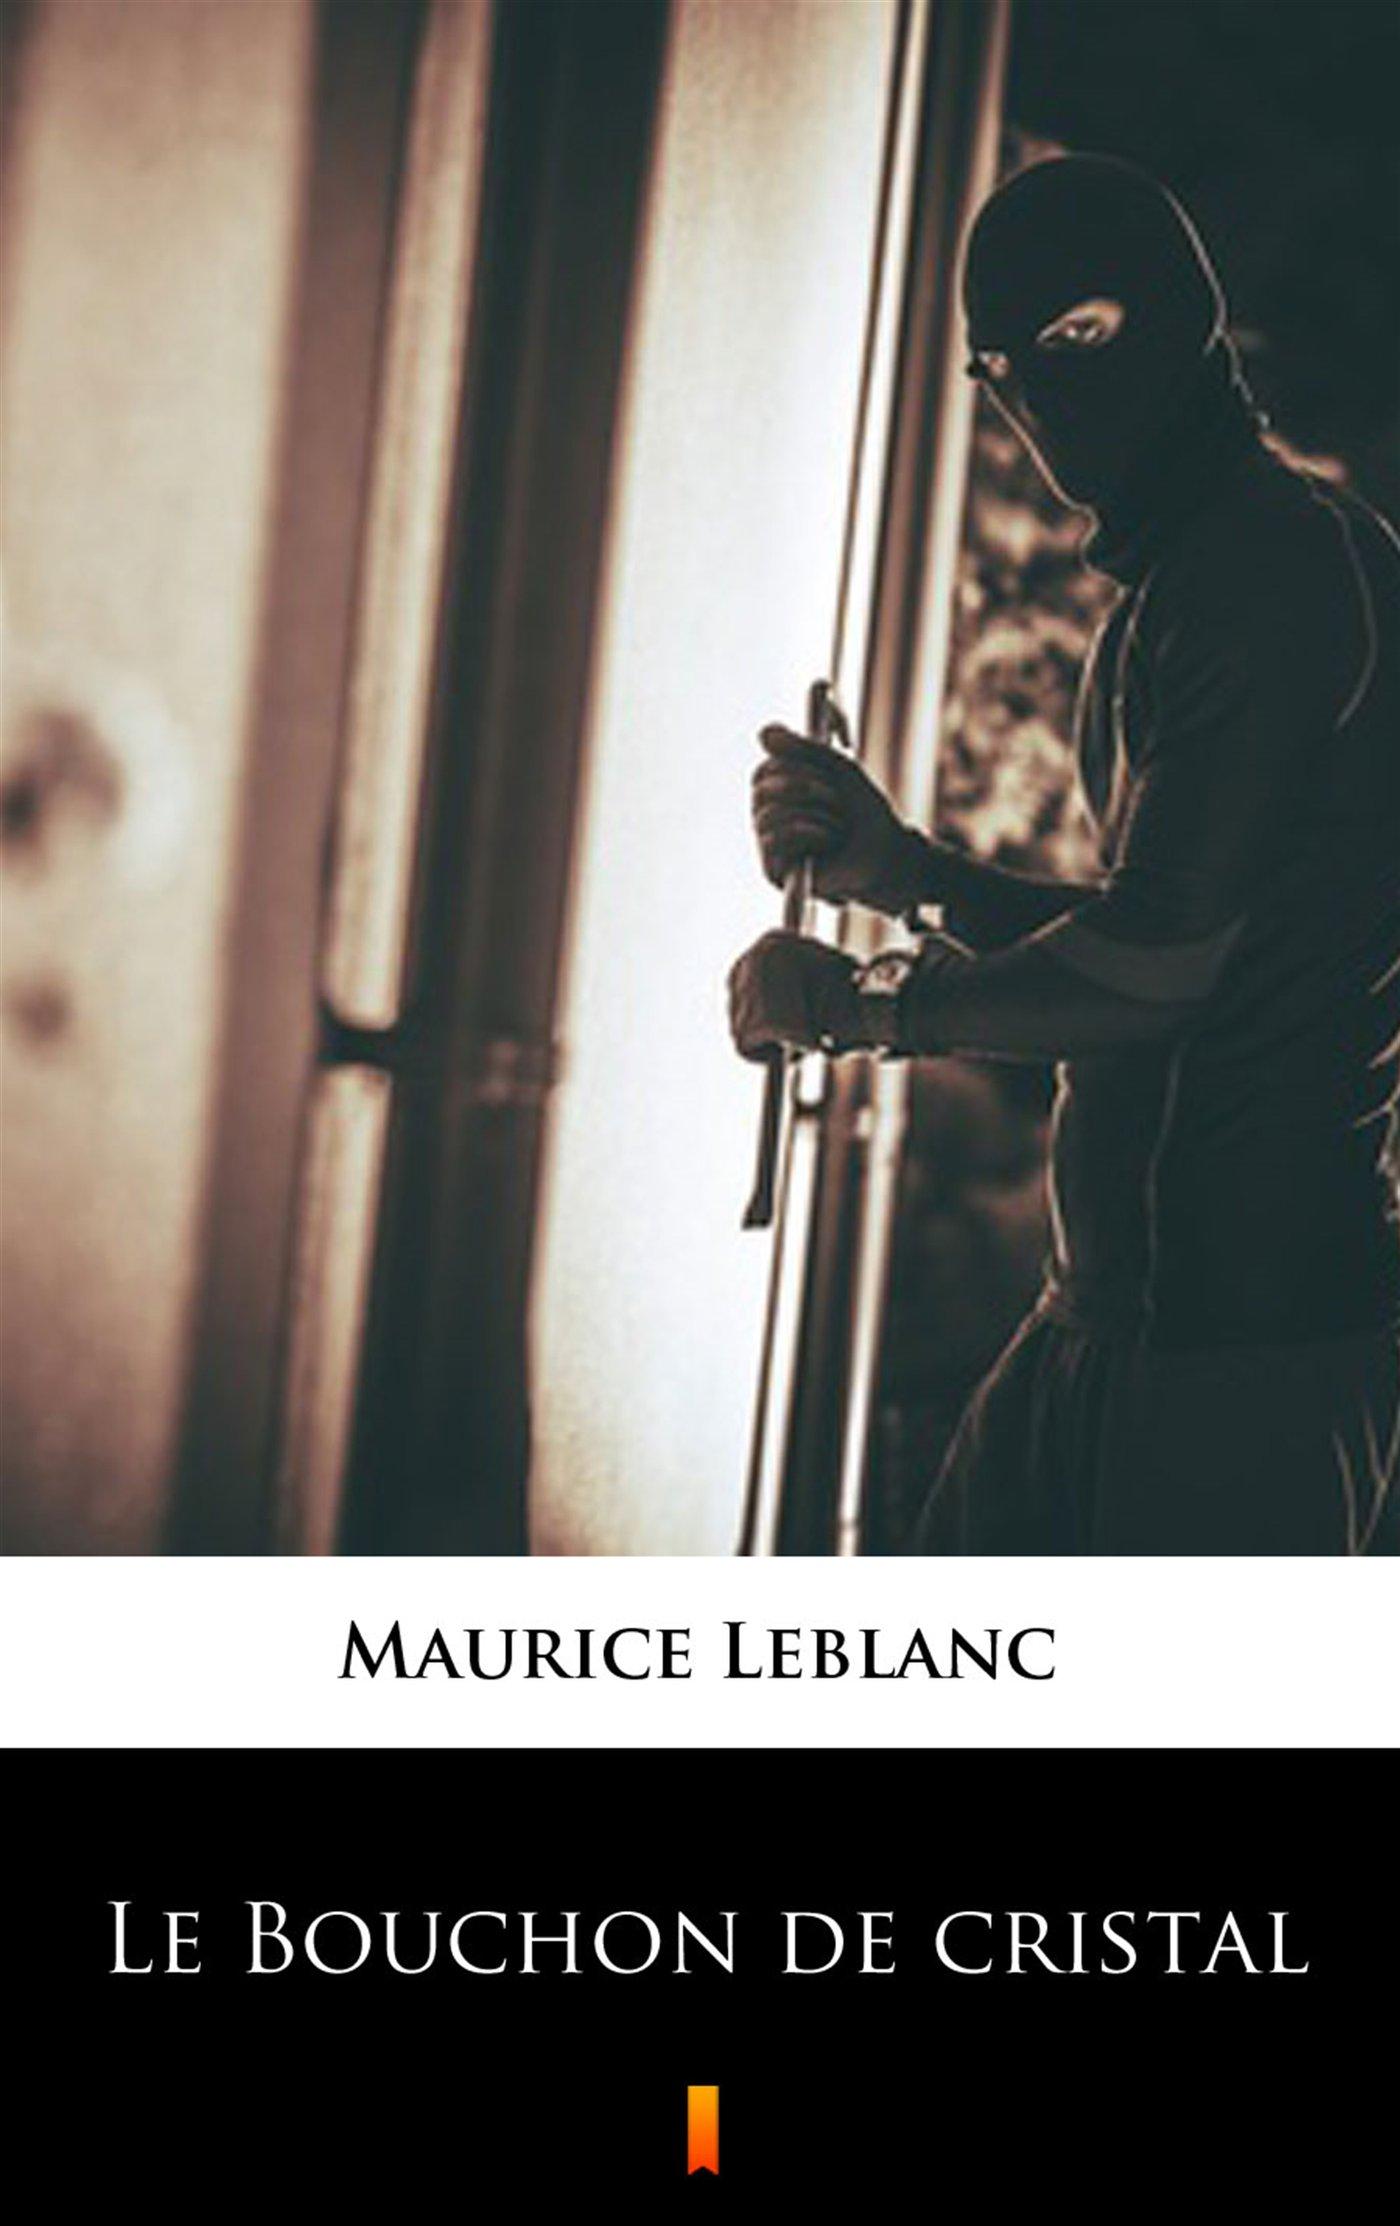 Le Bouchon de cristal - Ebook (Książka EPUB) do pobrania w formacie EPUB